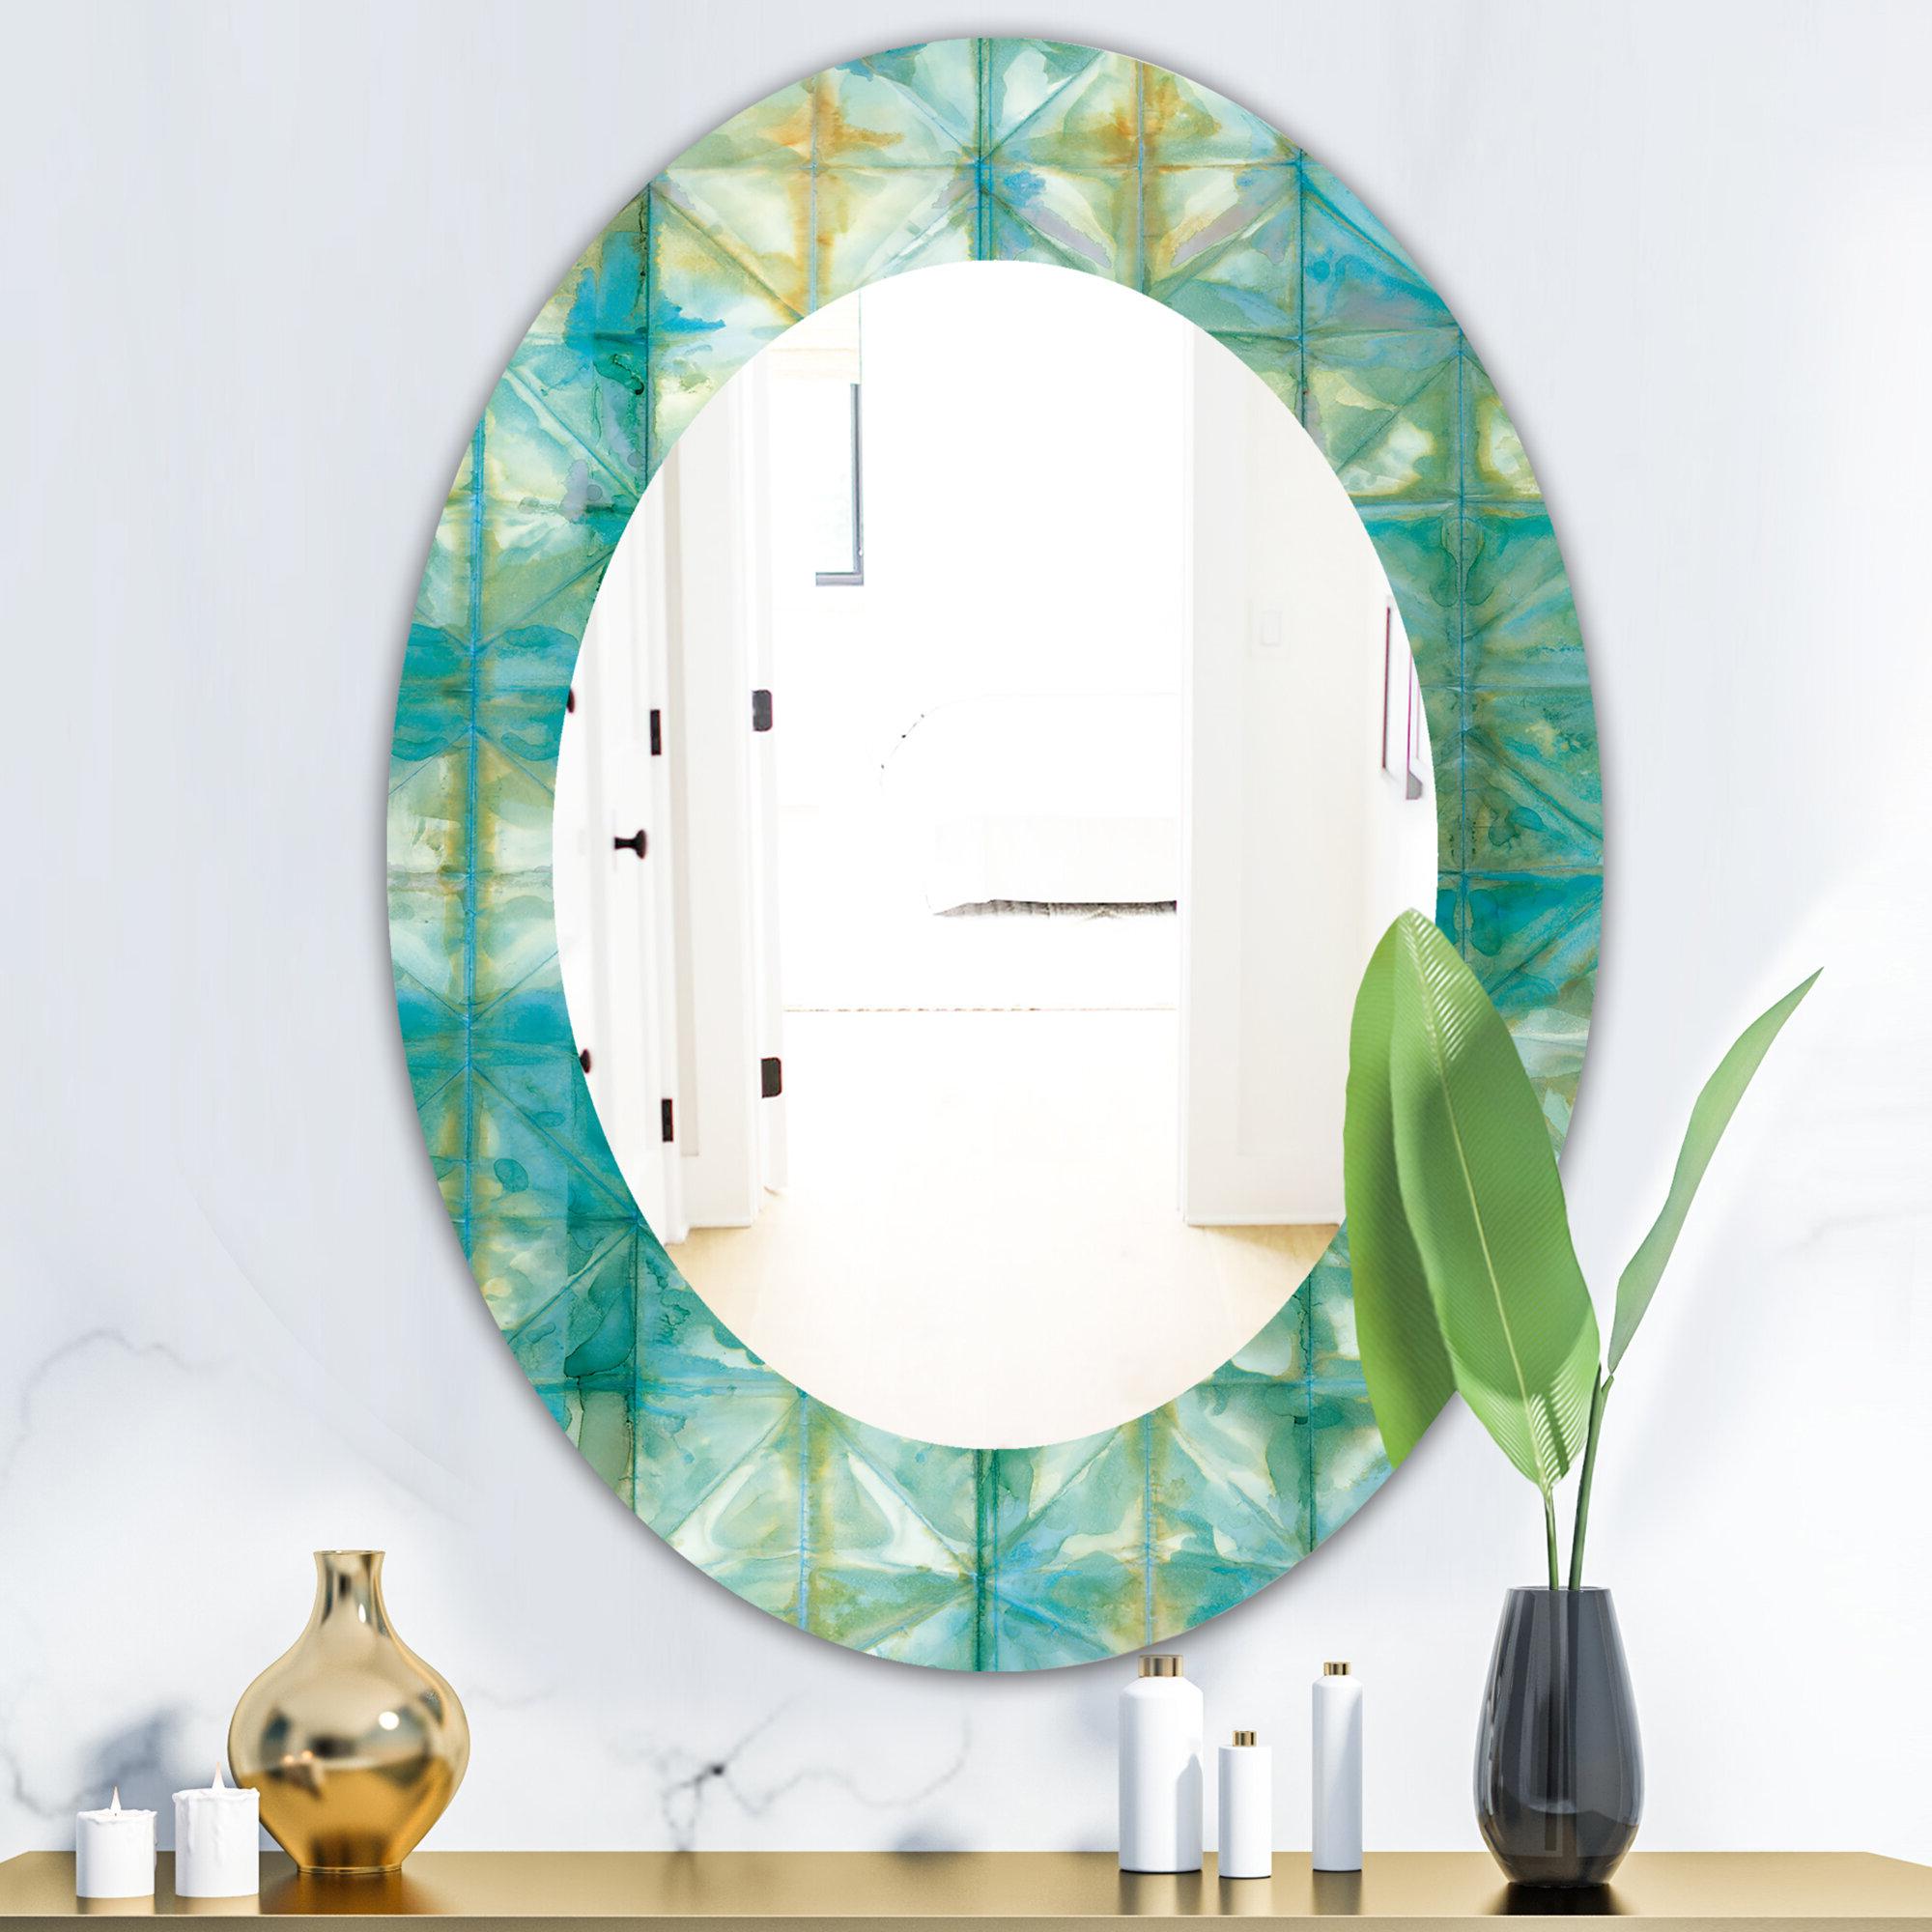 Diamonds Minimal Geometric I Mid Century Frameless Wall Mirror Inside 2019 Traditional Frameless Diamond Wall Mirrors (View 7 of 20)